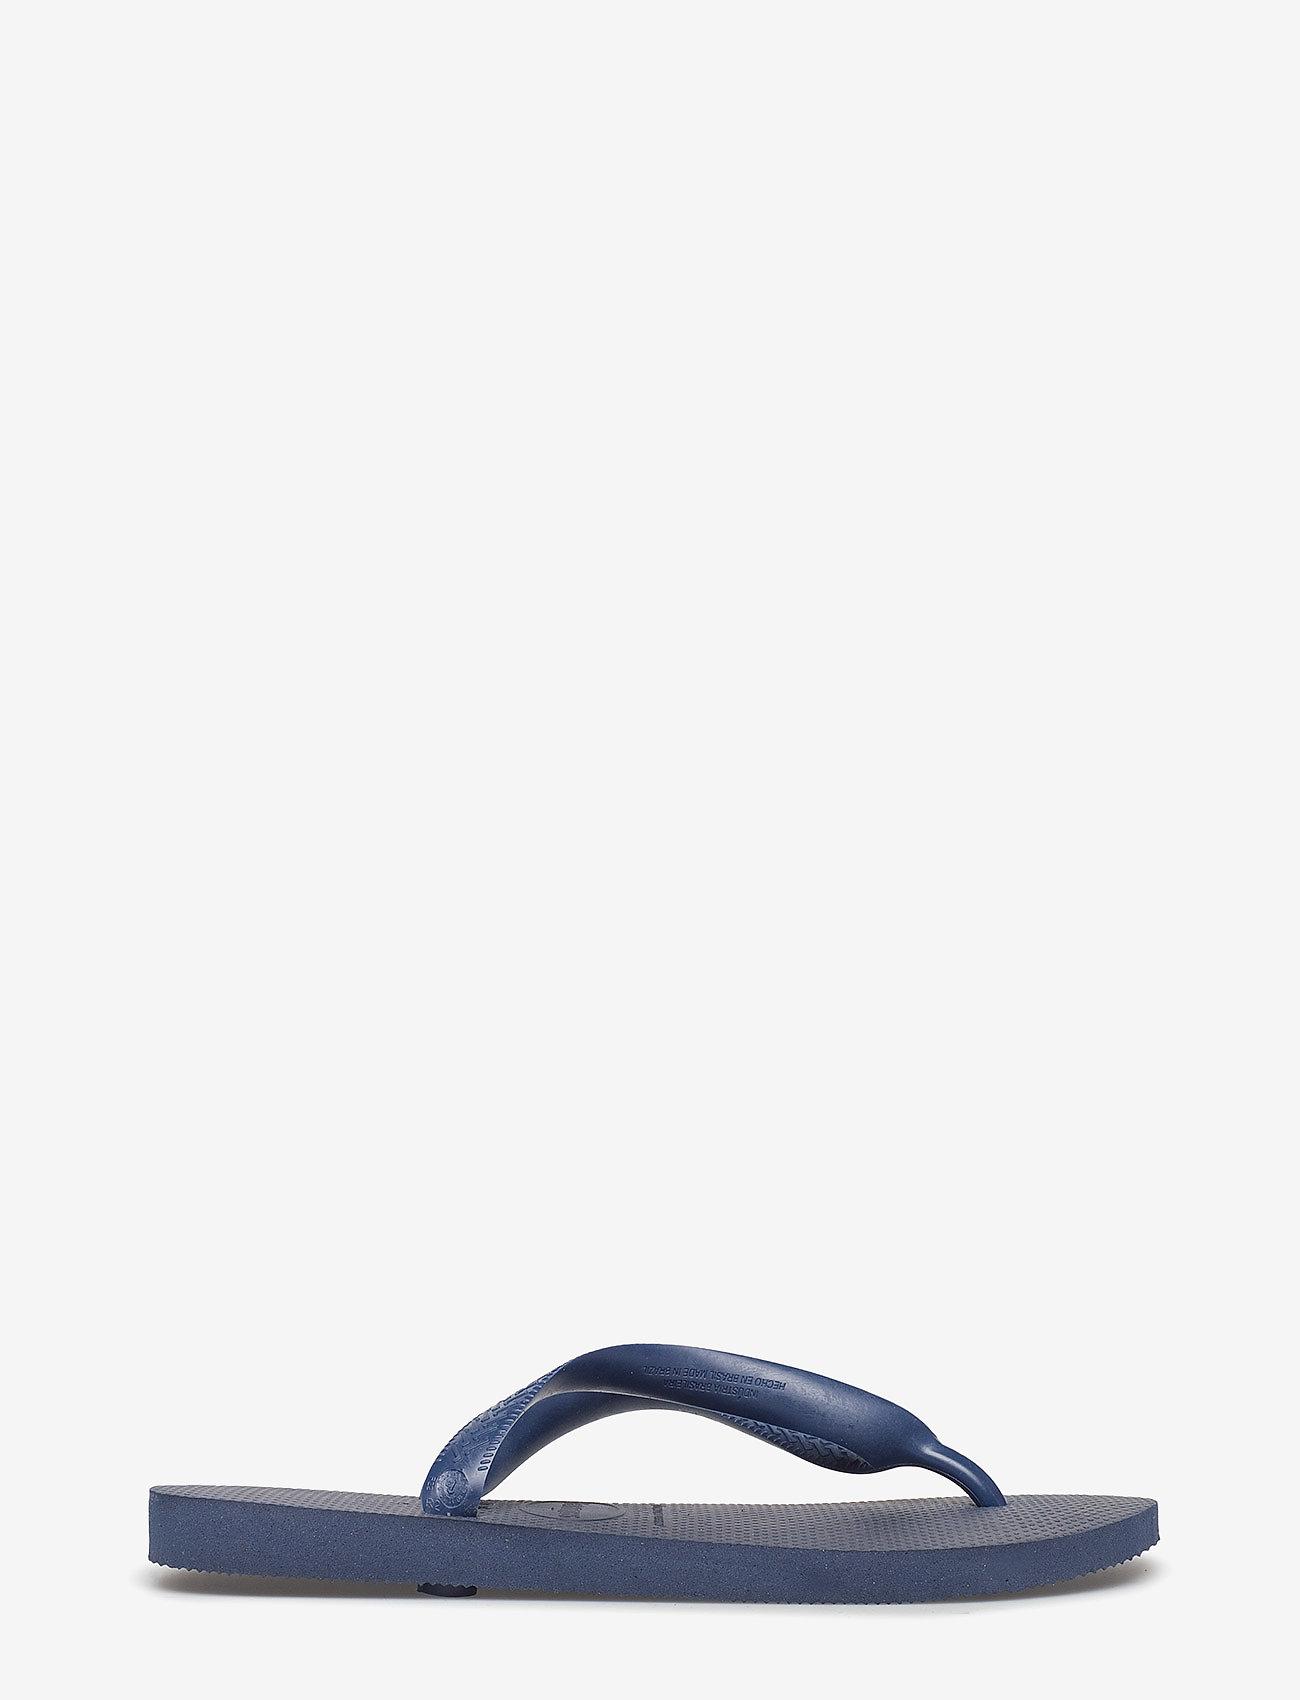 Havaianas - Top - teen slippers - navy blue 0555 - 1